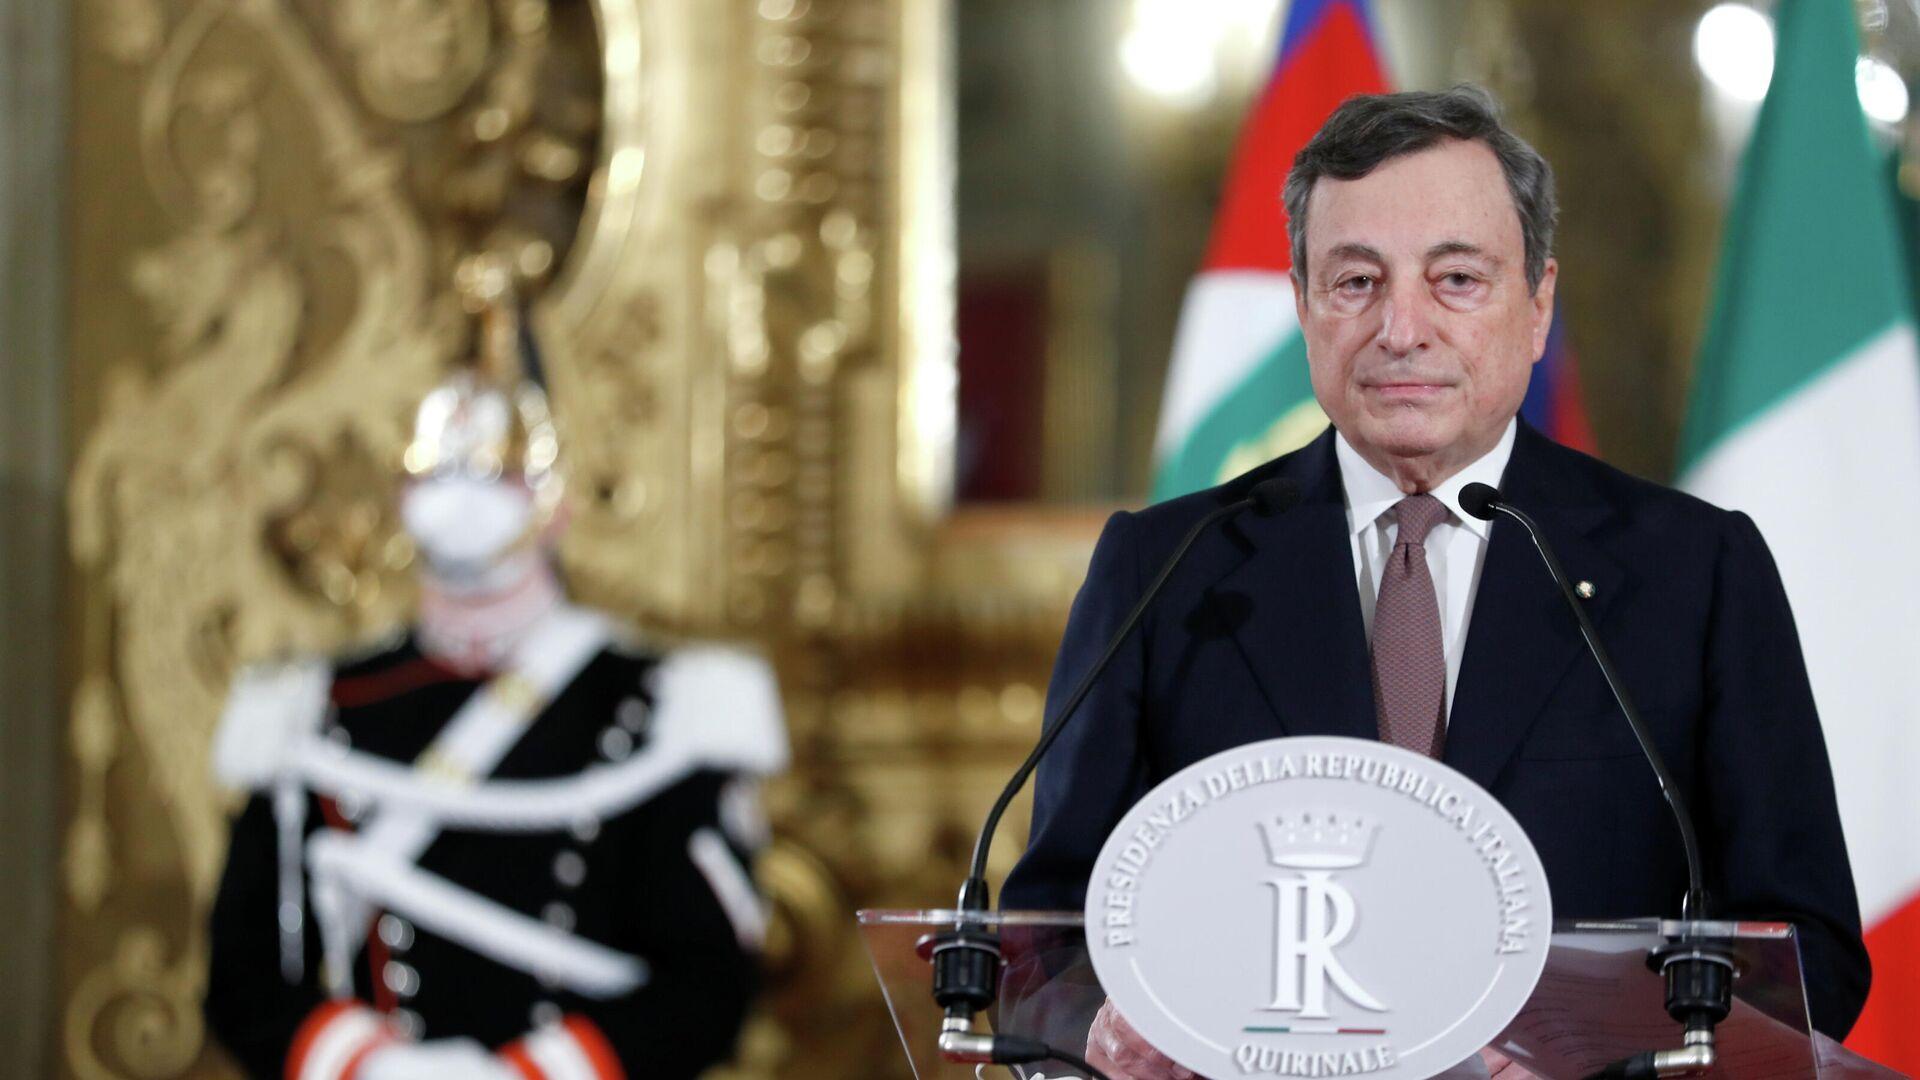 Mario Draghi, primer ministro de Italia - Sputnik Mundo, 1920, 20.05.2021